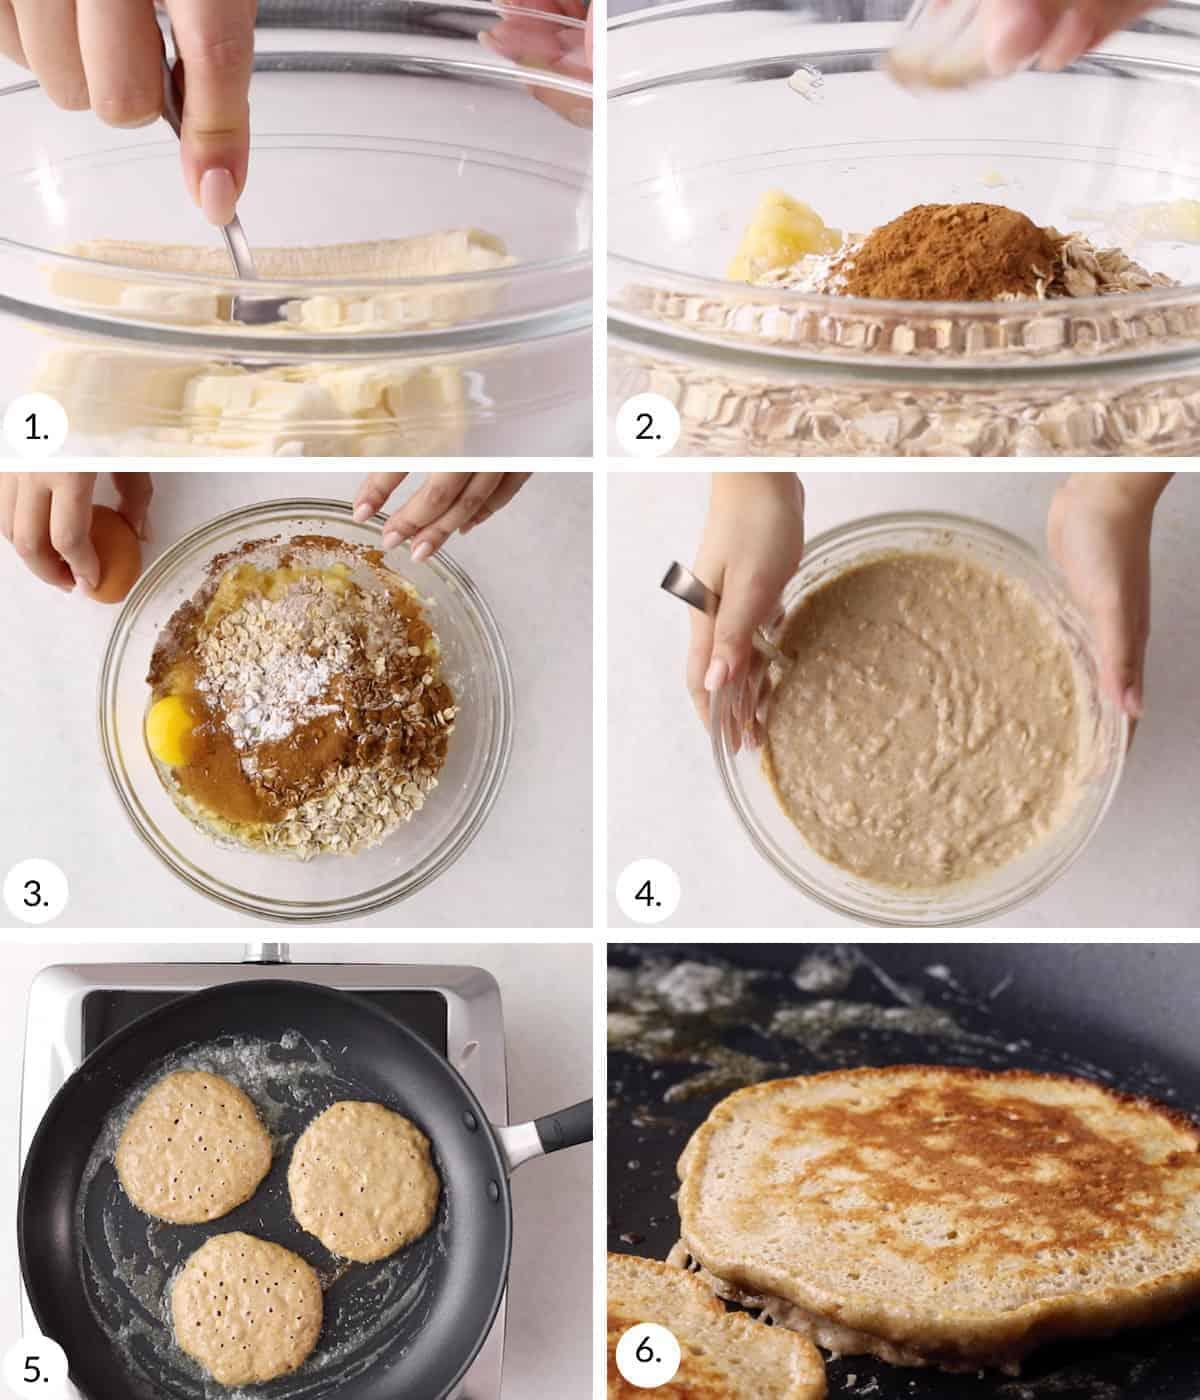 how-to-make-banana-oatmeal-pancakes-step-by-step